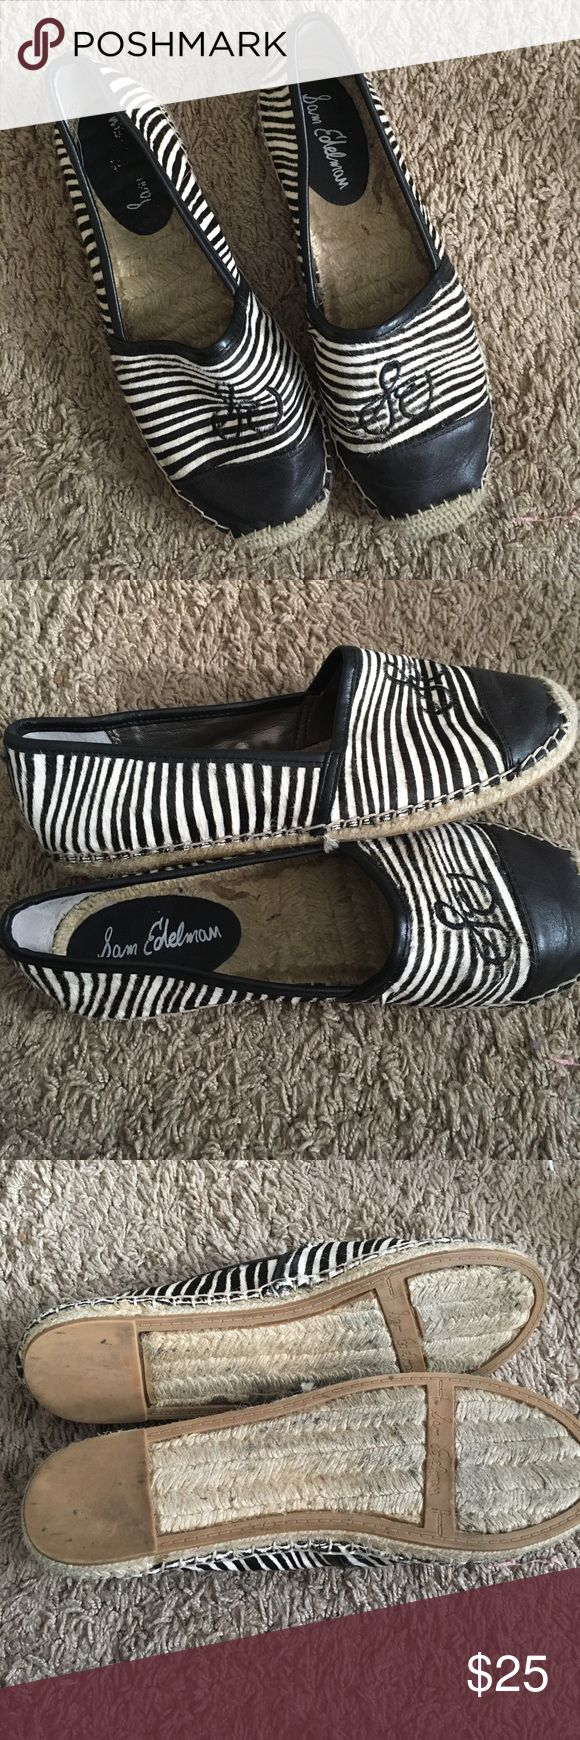 Sam Edelman leather animal print espadrilles Great shape, worn a couple of times Sam Edelman Shoes Espadrilles